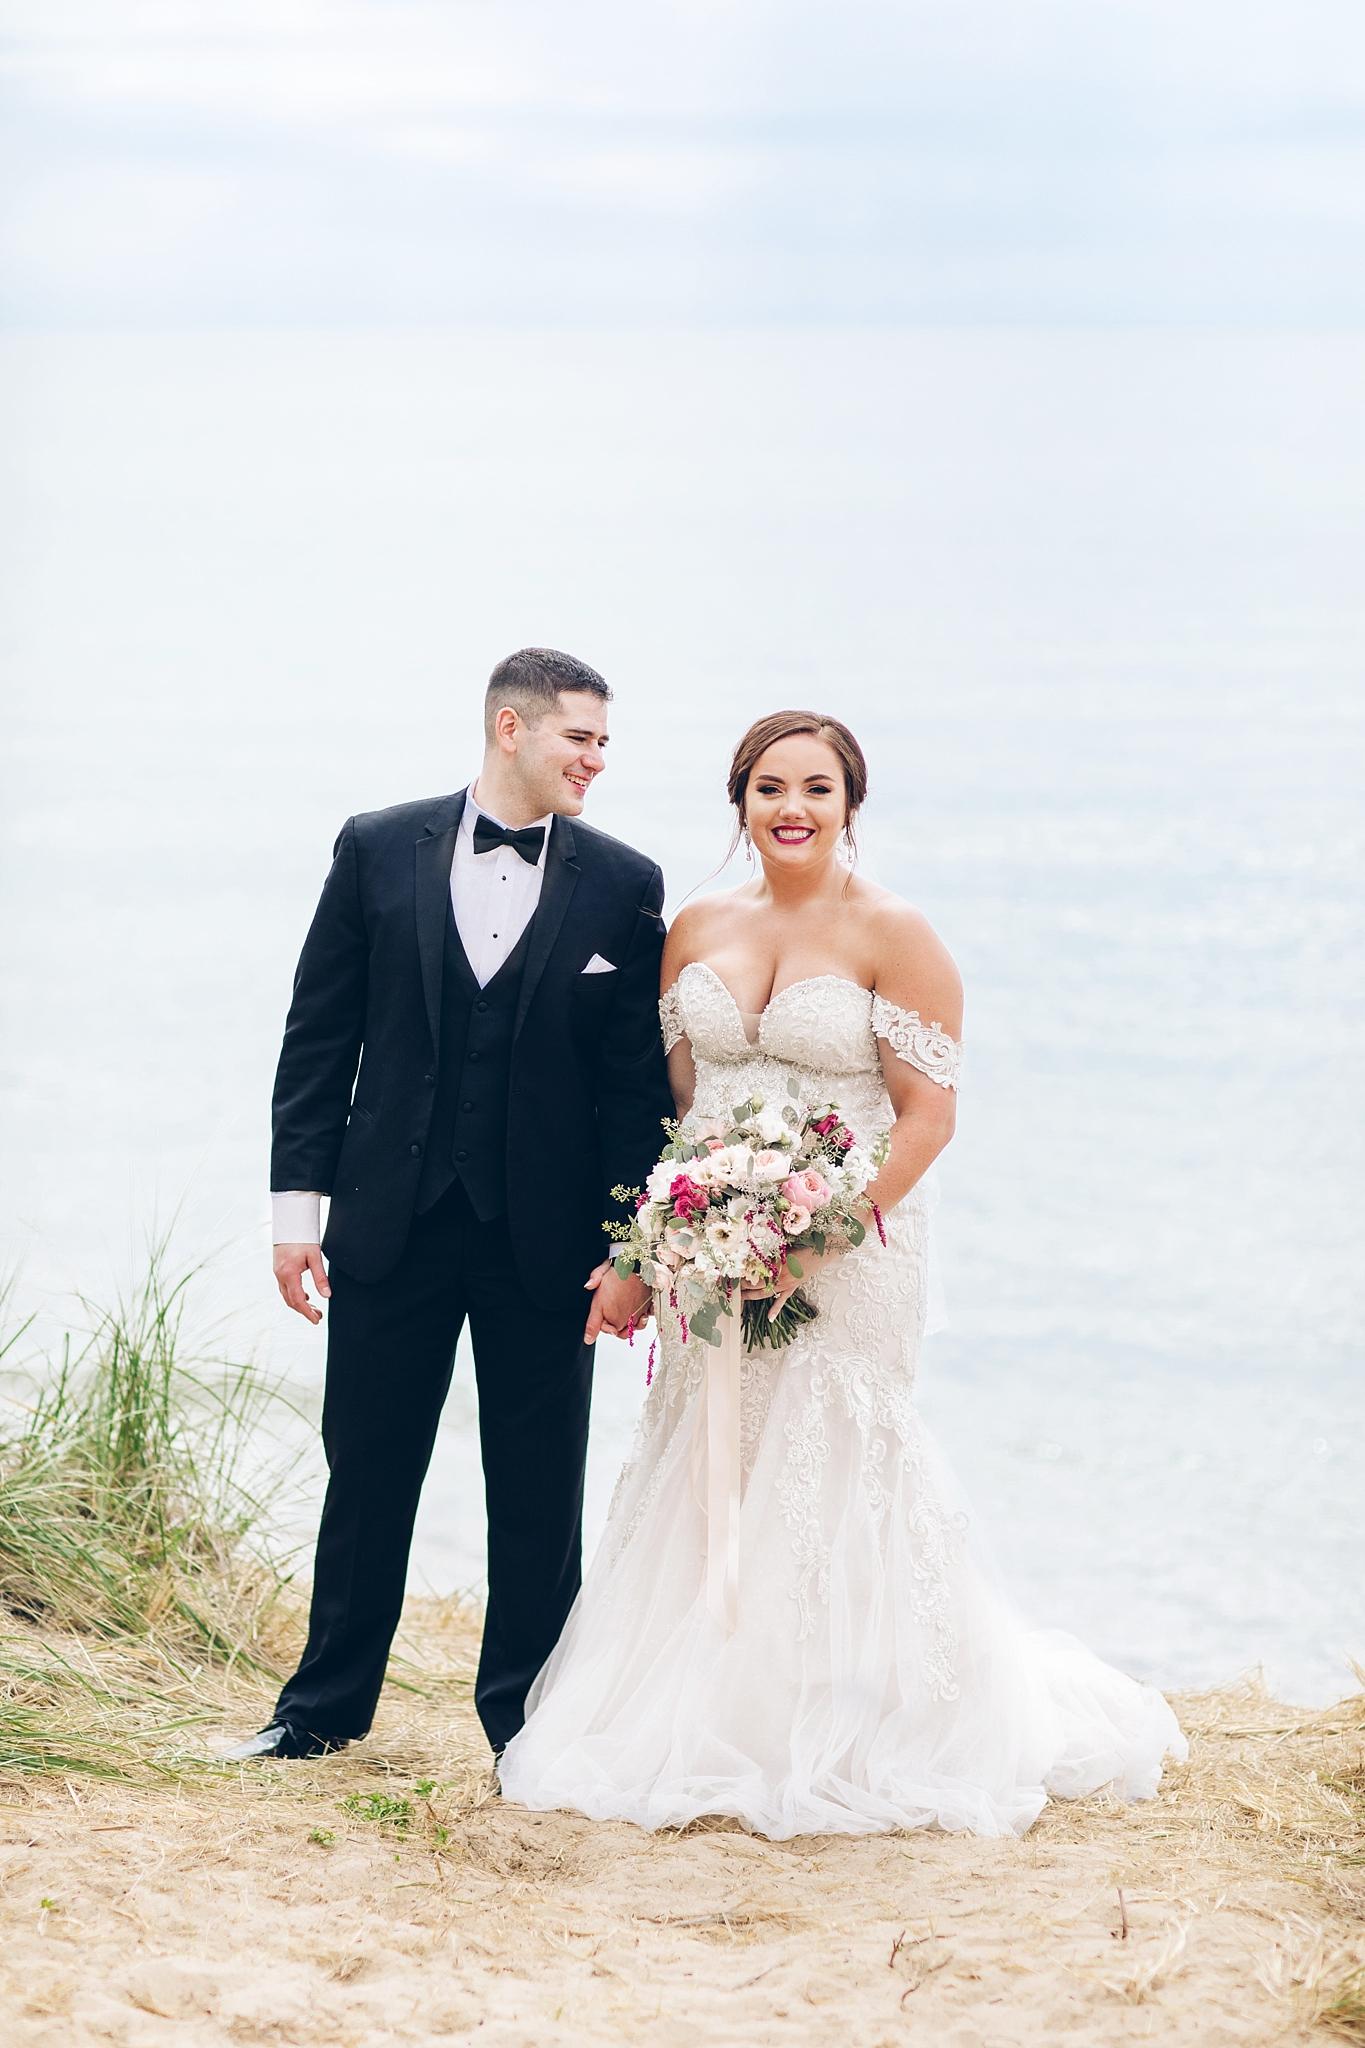 baker-lofts-holland-michigan-wedding-photographer_0342.jpg